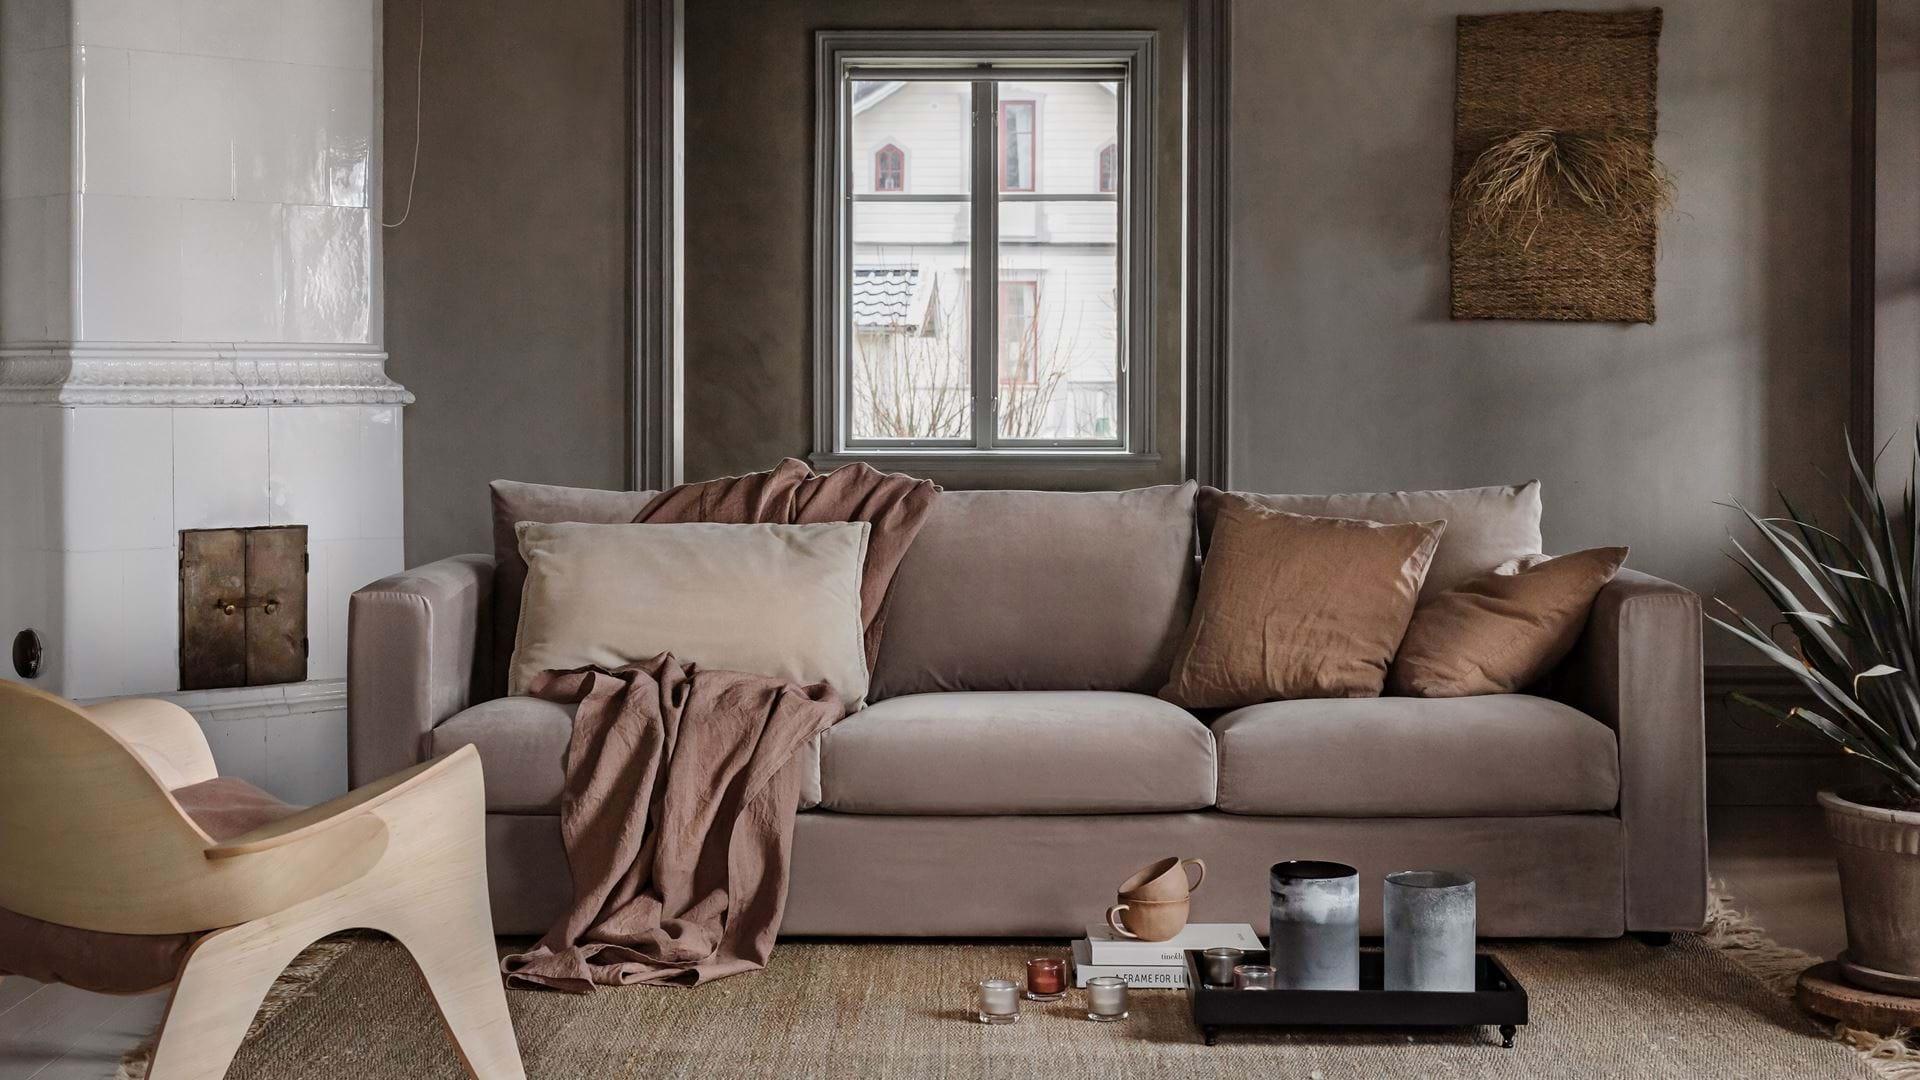 Gambe Per Mobili Ikea ikea vimle sofa review by bemz | bemz